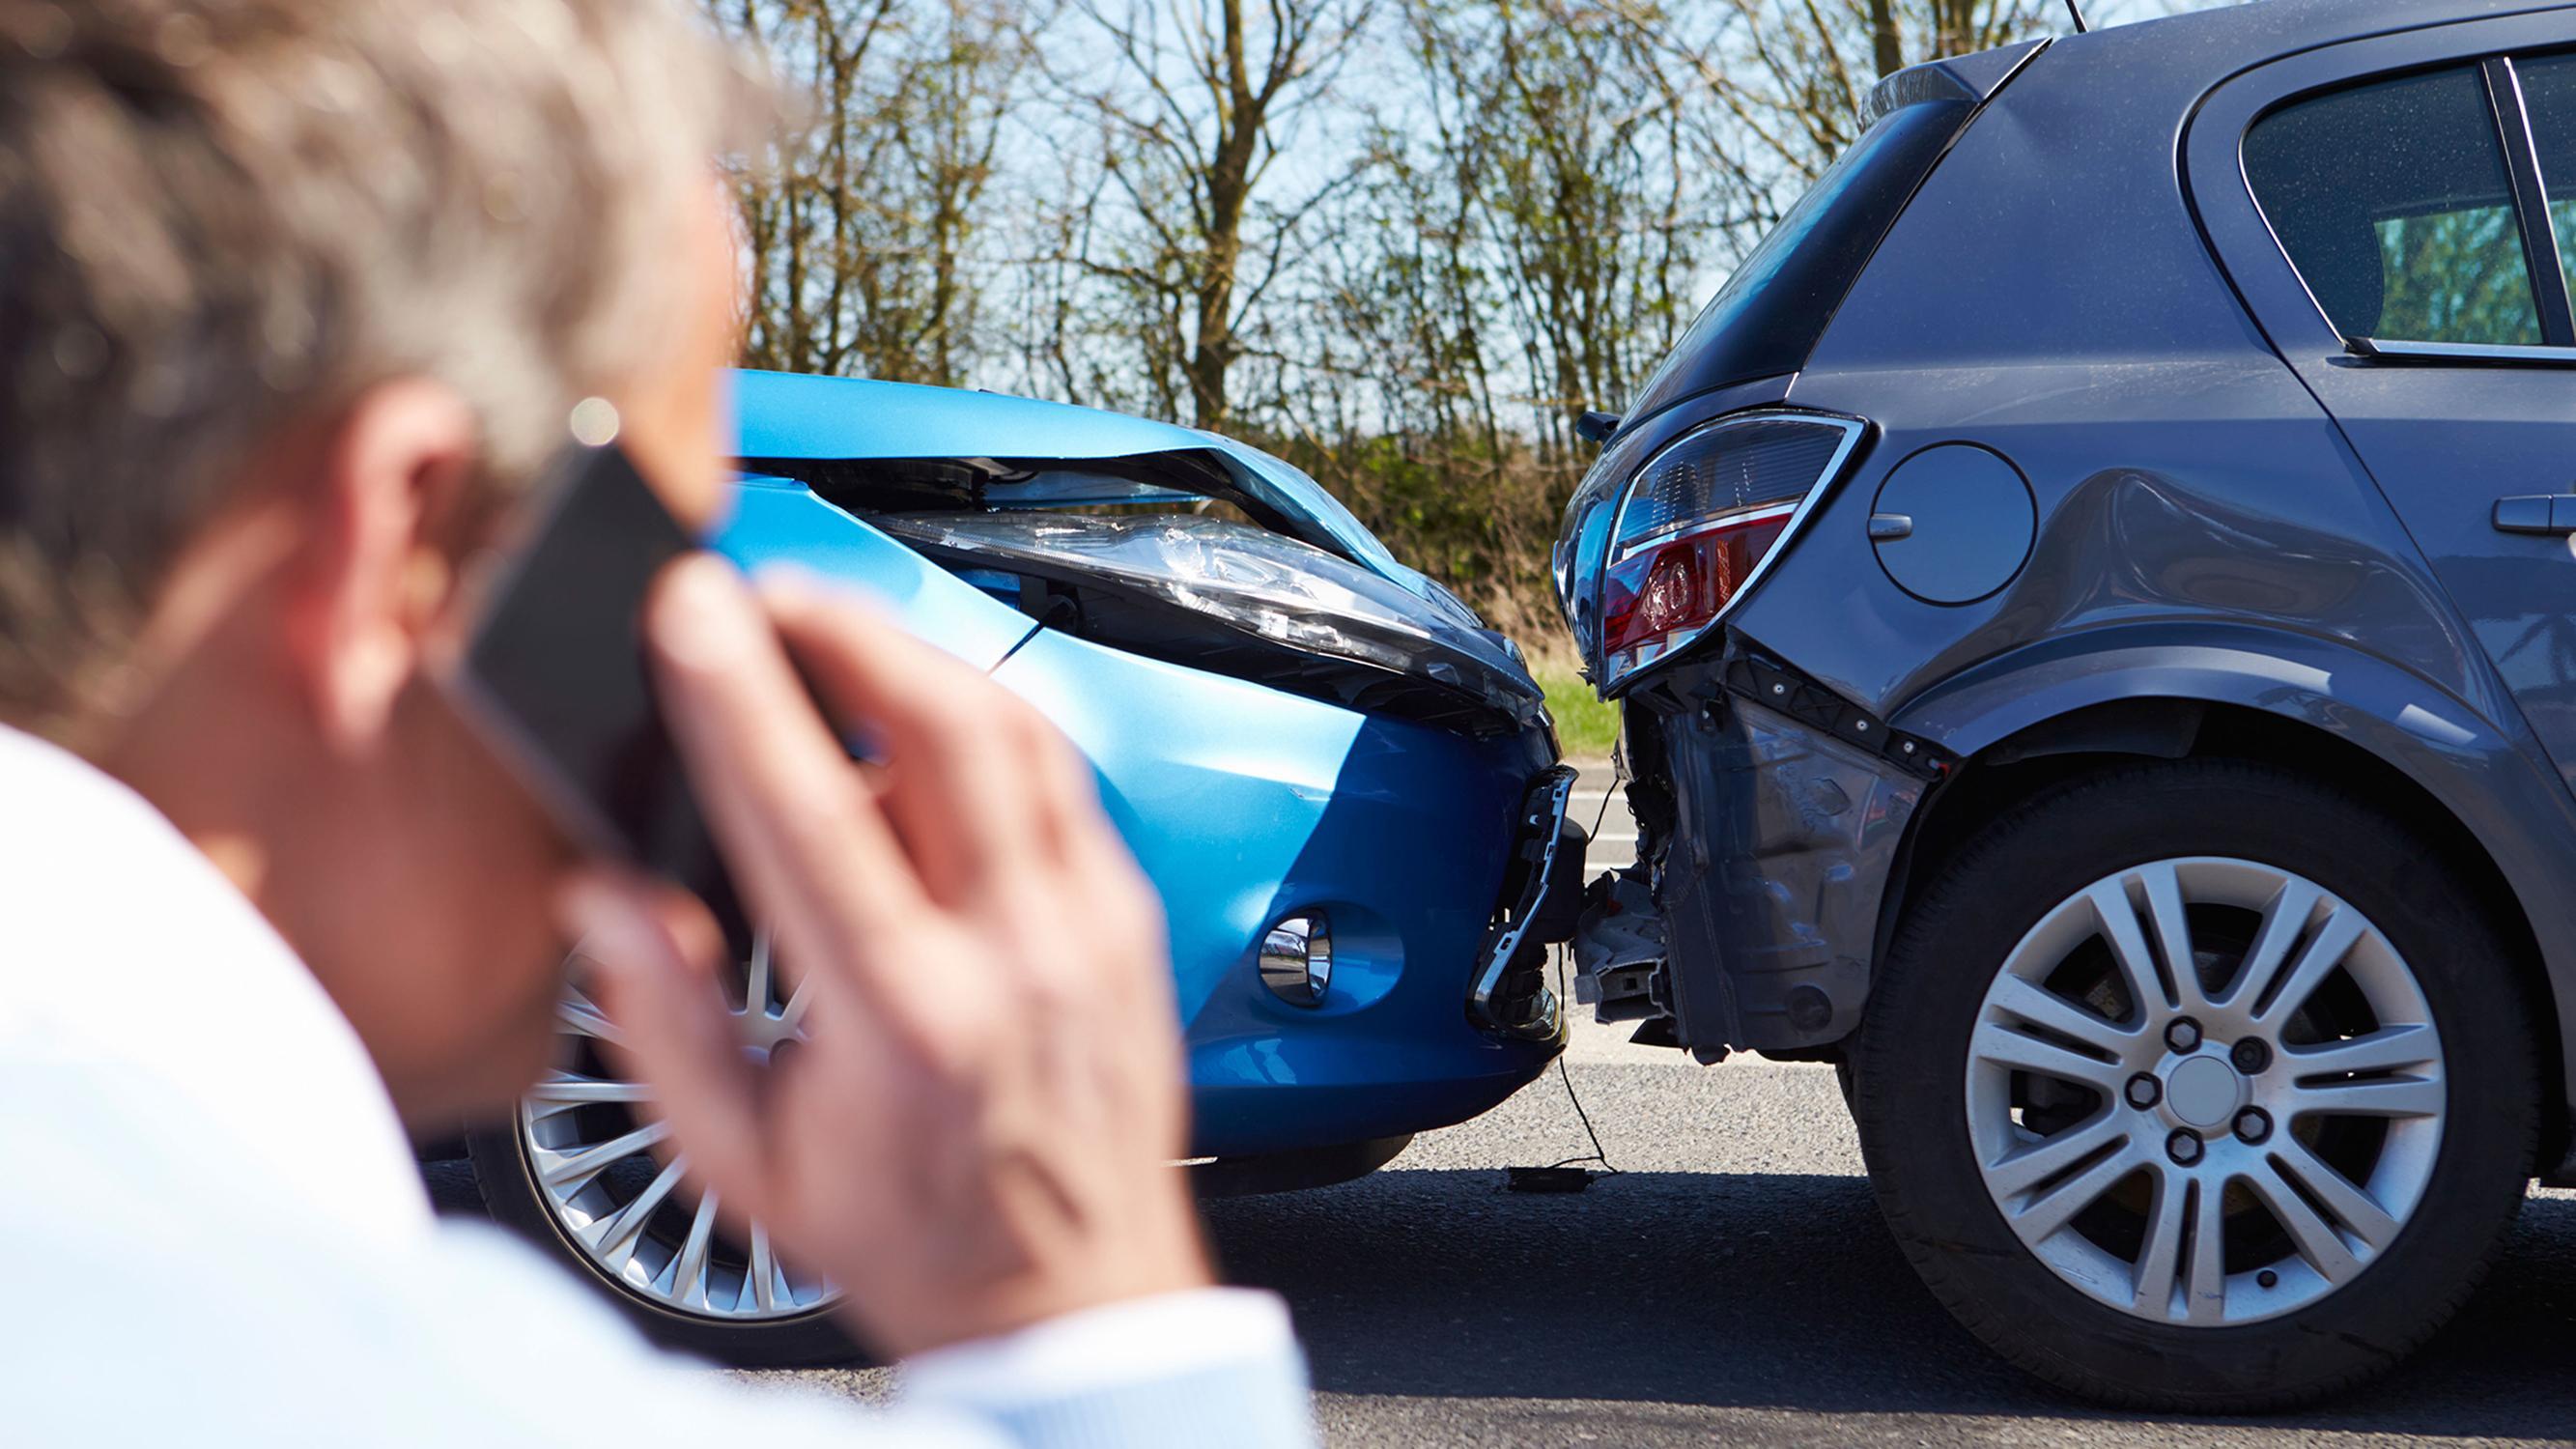 SOAT necesidad e importancia del seguro obligatorio de accidentes de transito